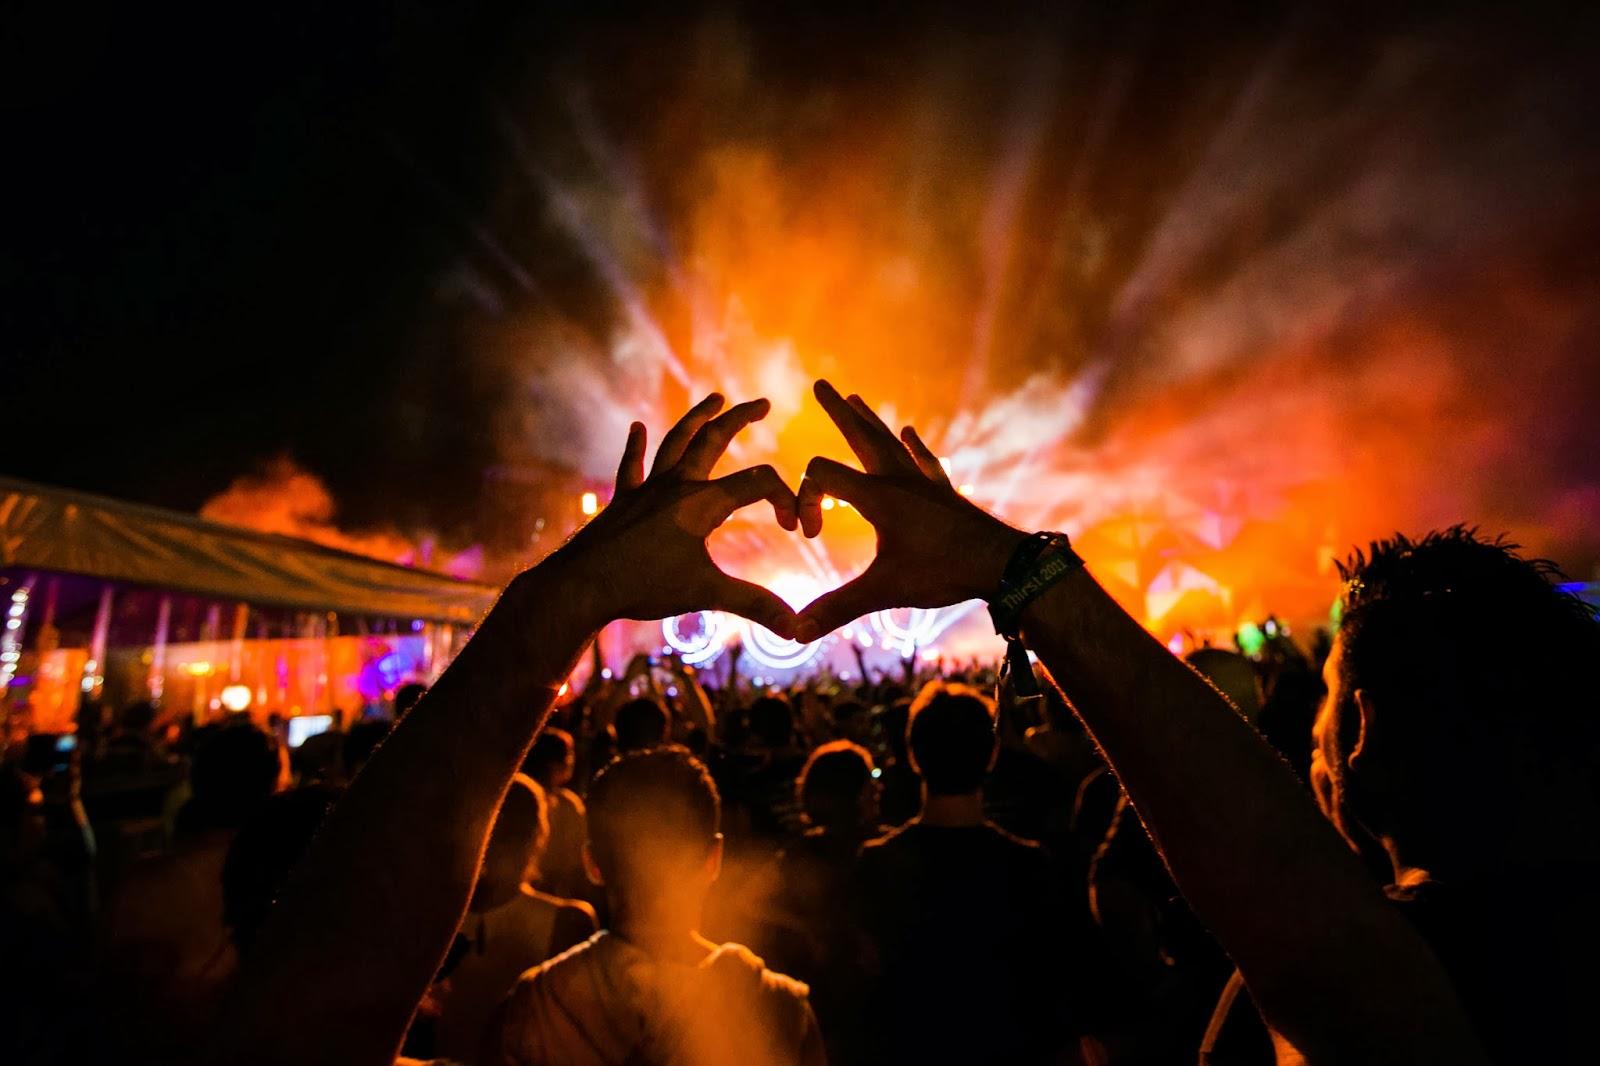 Edm love songs